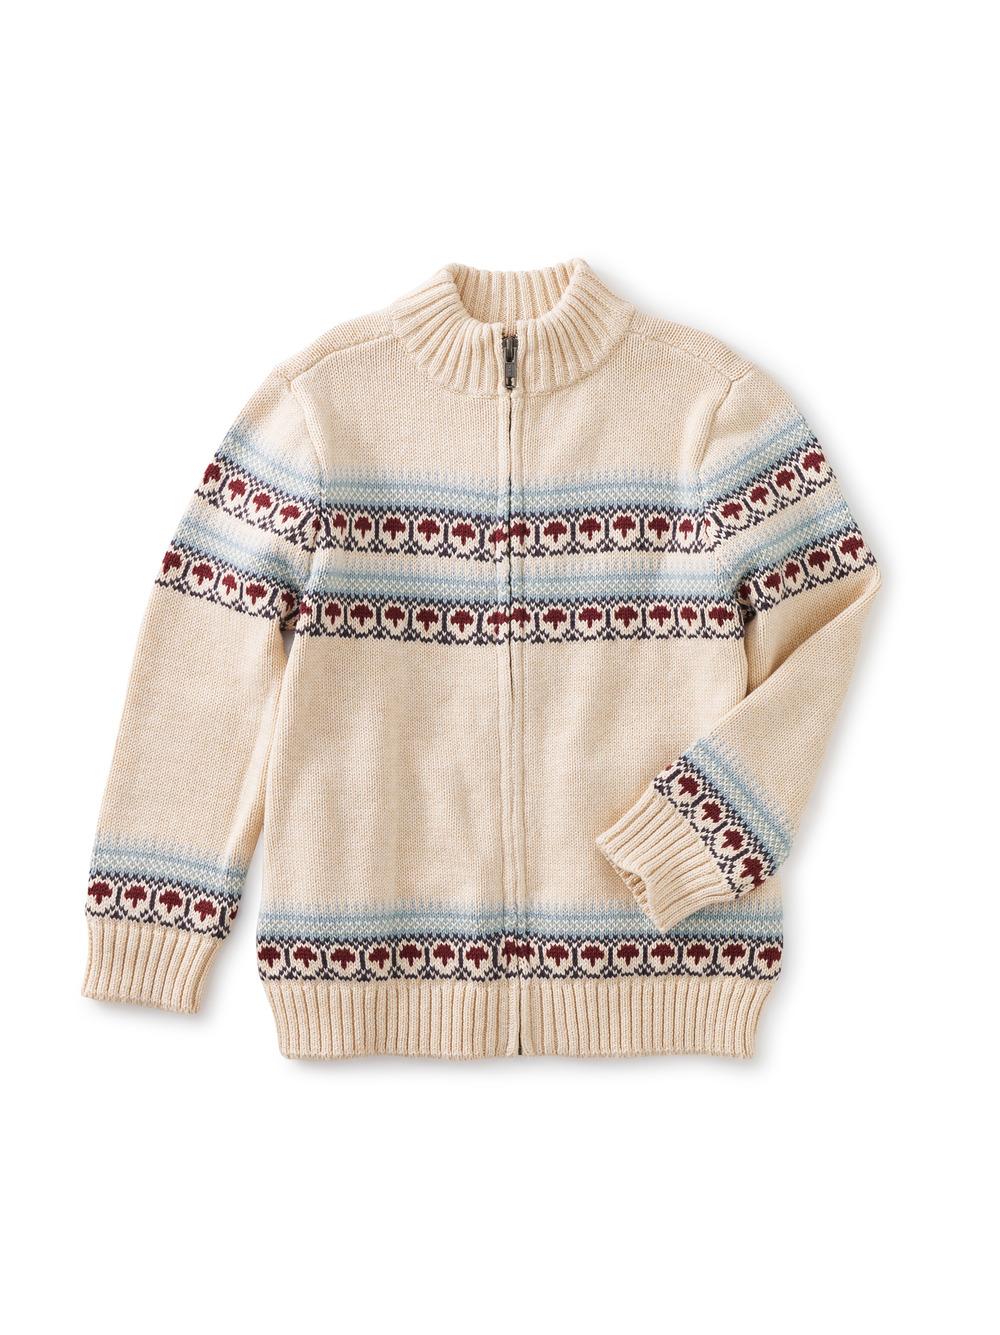 Toasty Traveler Zip Sweater